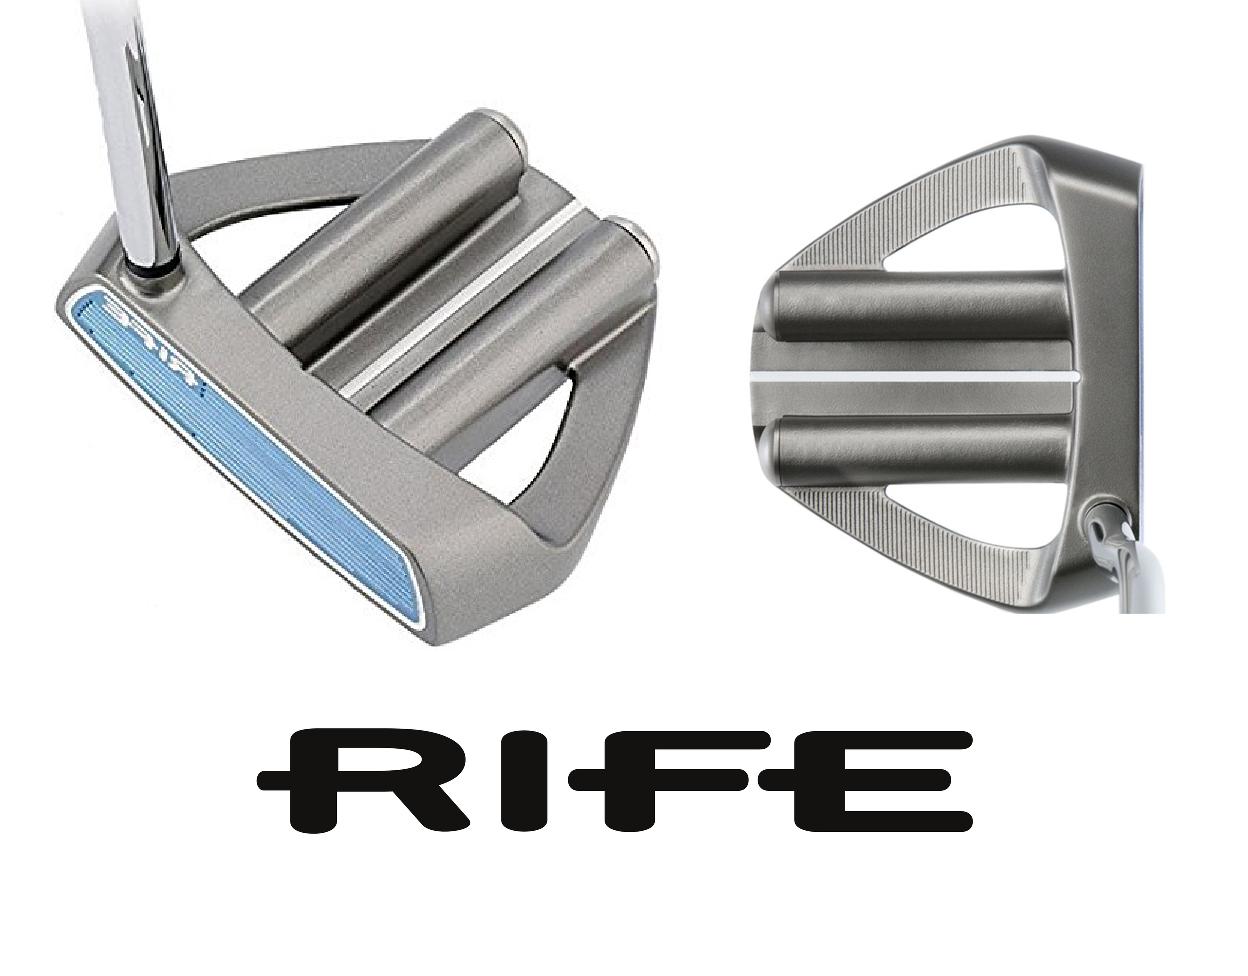 Details about New Rife Tour 2 Bar Hybrid Mallet Satin Golf Putter Left Hand  Belly Putter 43